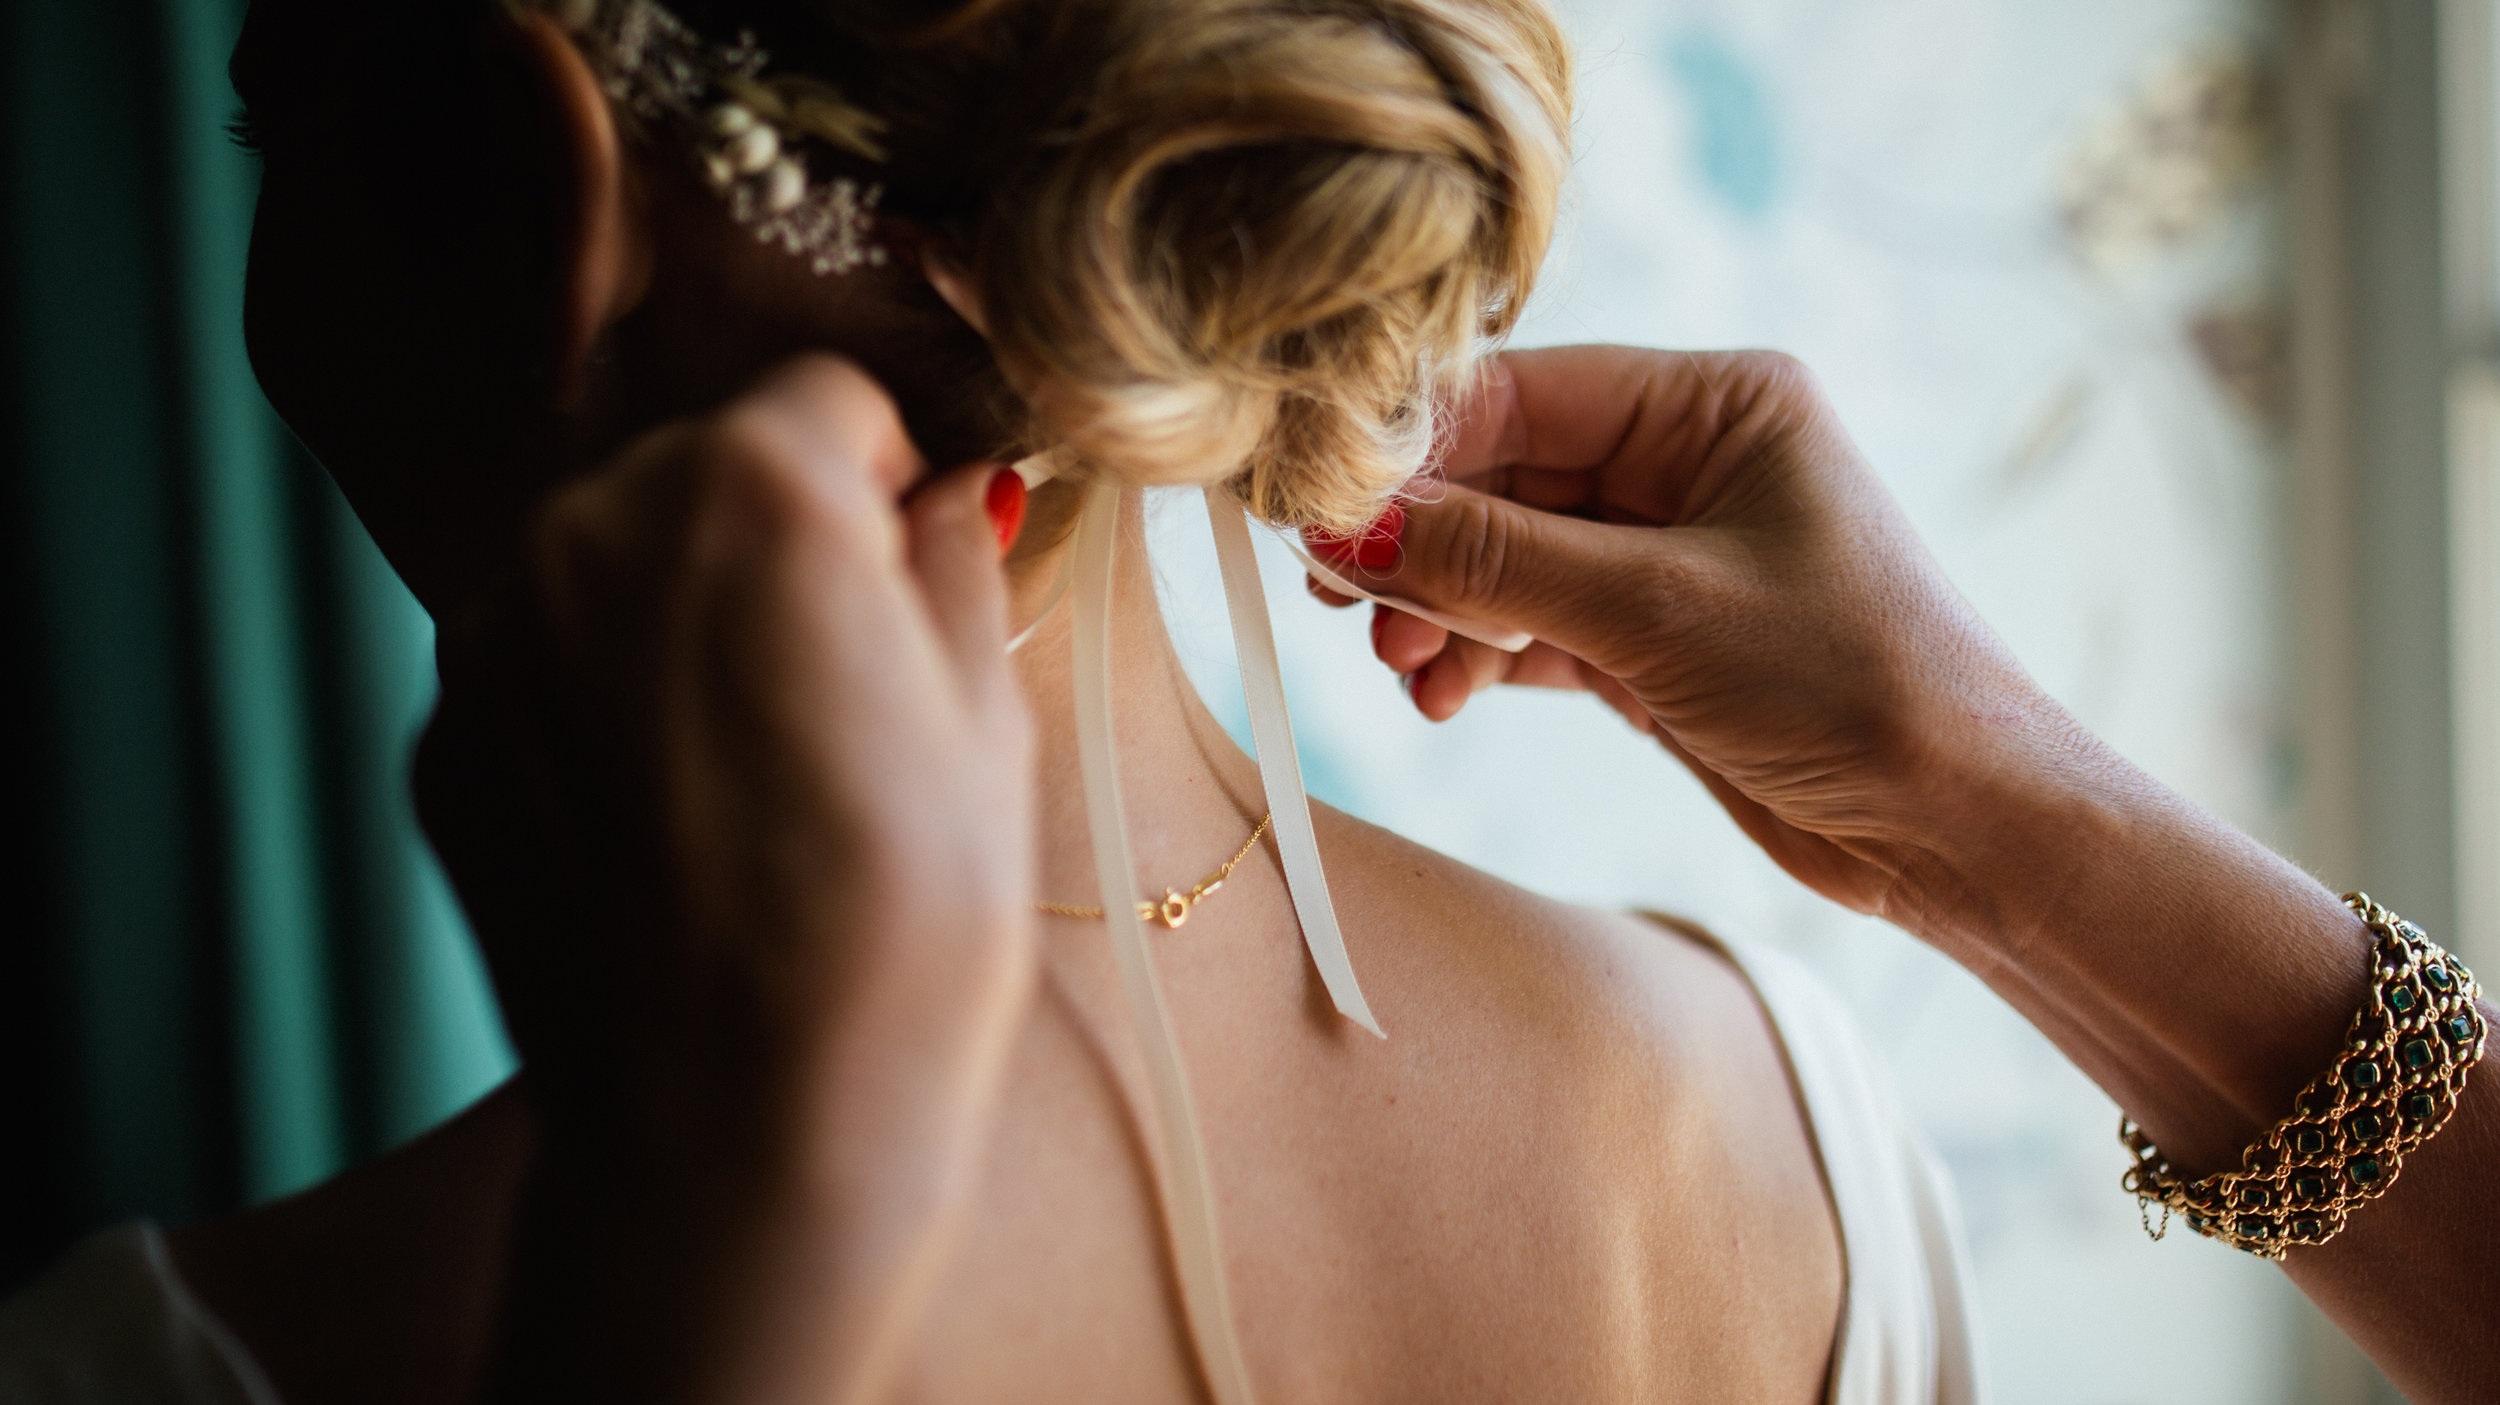 Wedding Day Helpers - By the hour or the dayCodee Bunting 319.929.5311 codeebunting@gmail.comAnna Konchar 319.541.1238 annakonchar02@gmail.com